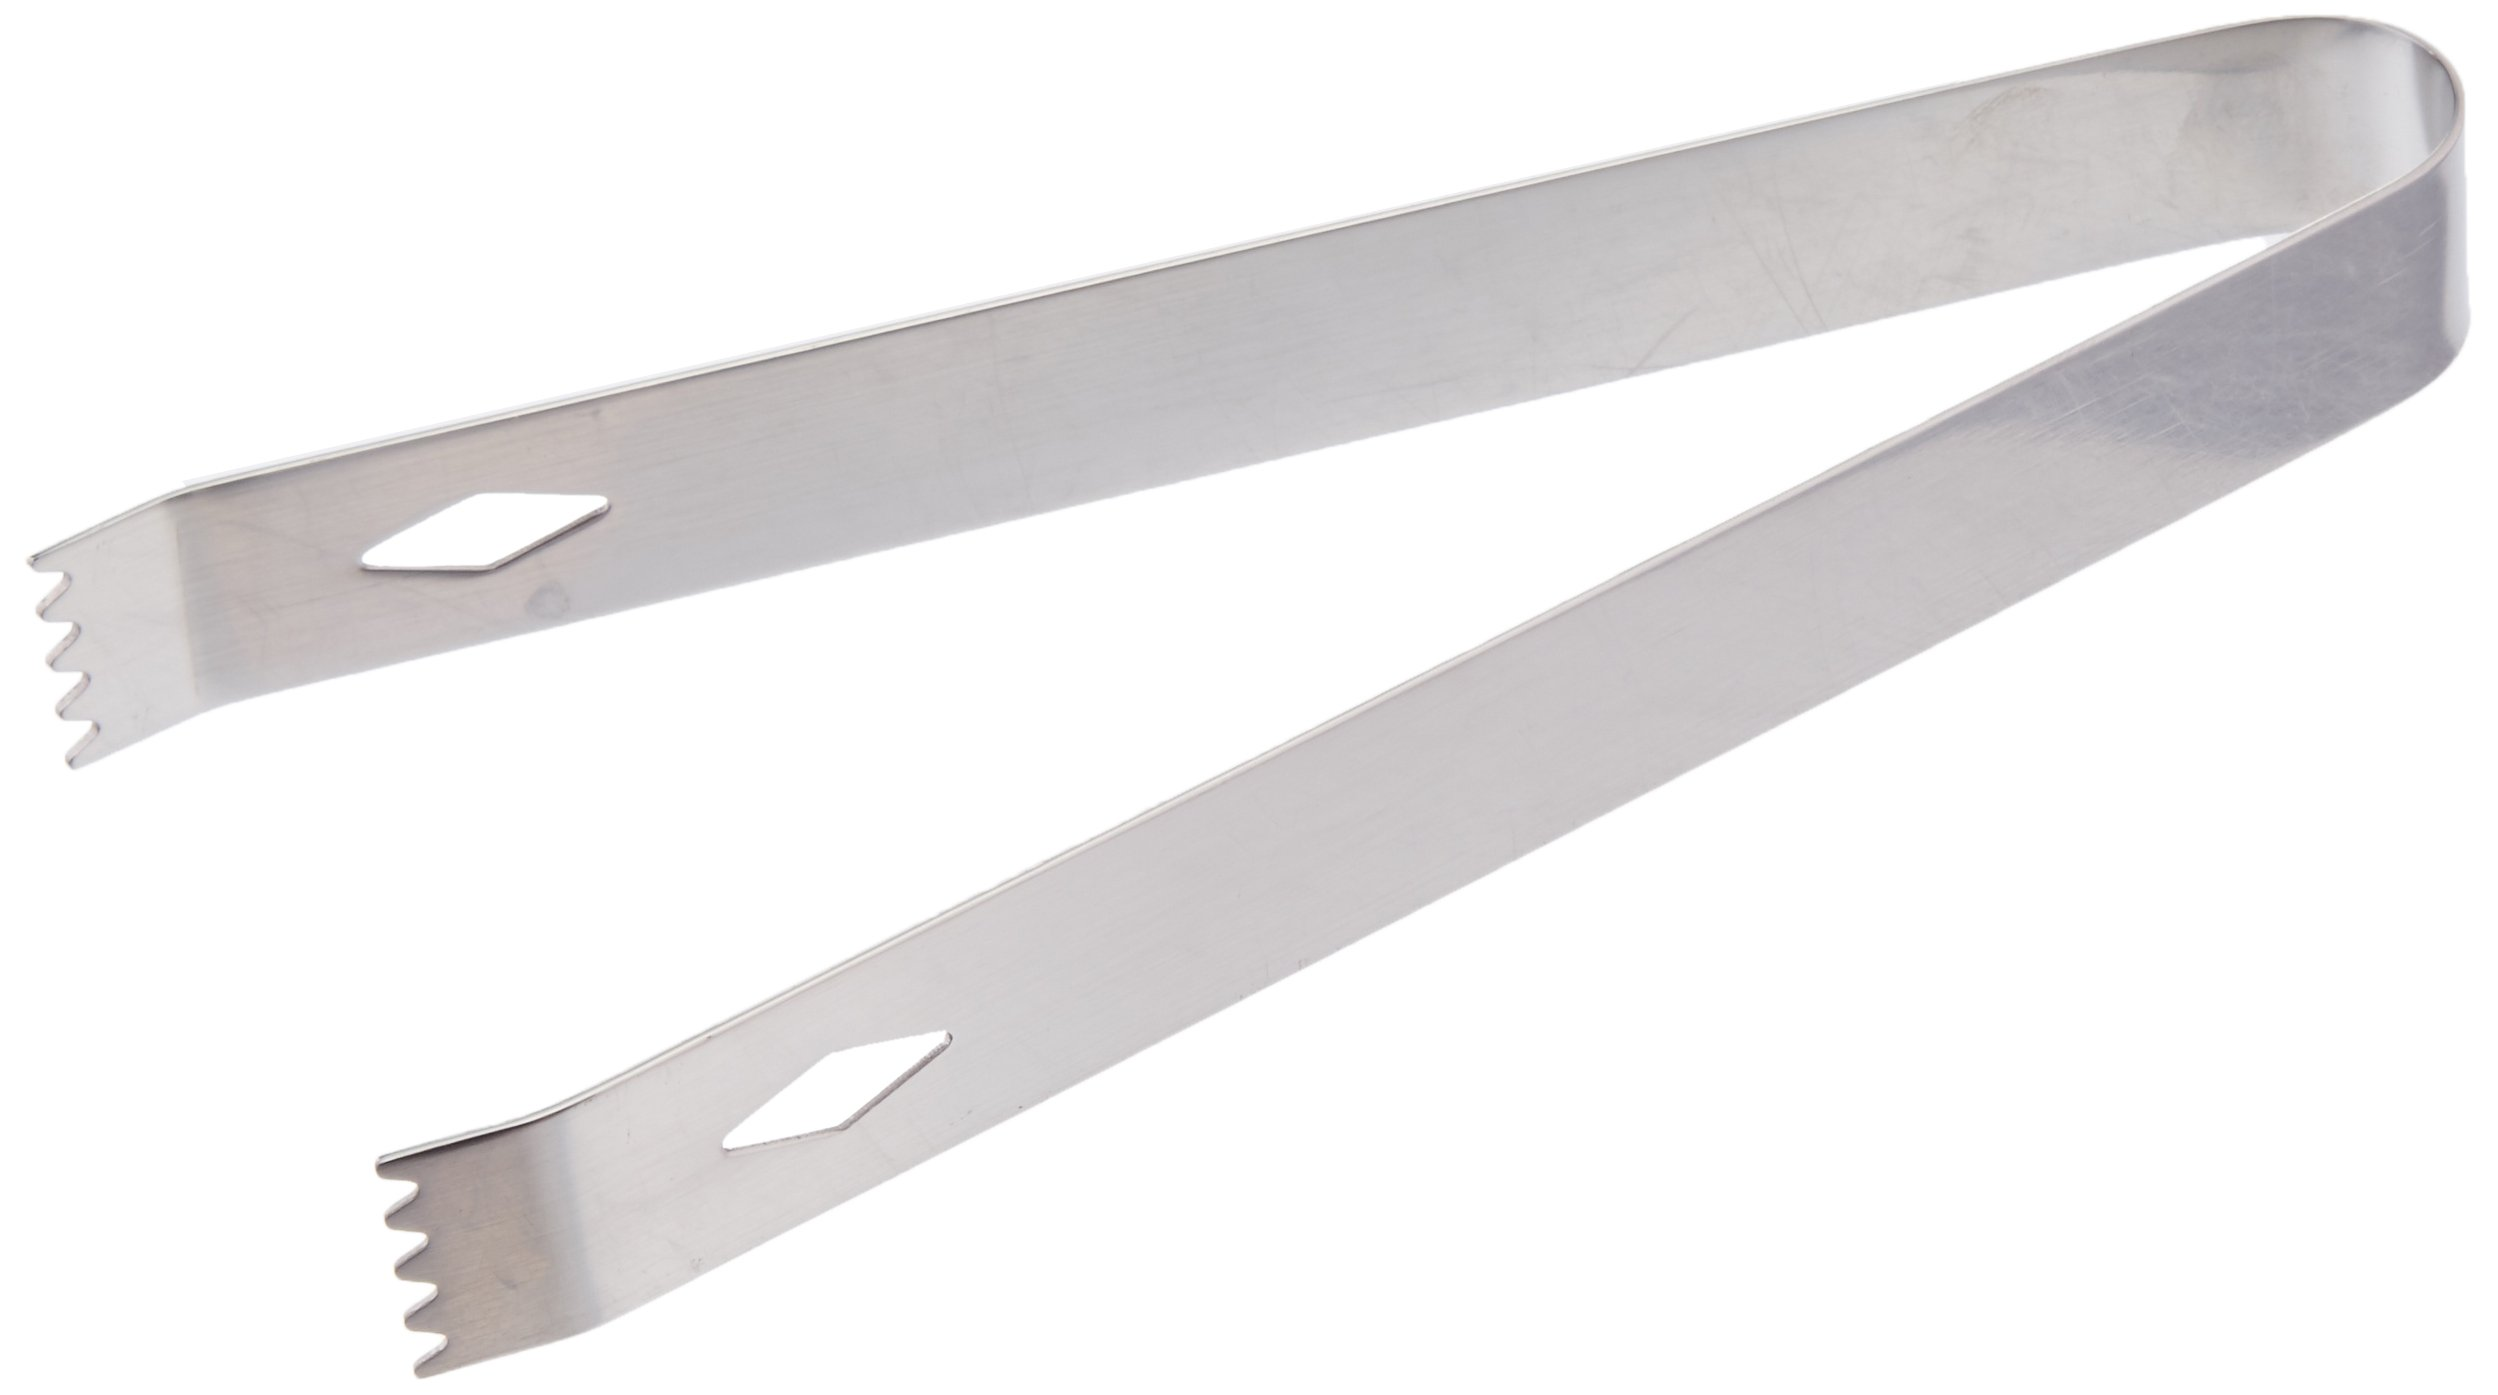 Tablecraft H1246 Stainless Steel Ice Tongs, 6.75'', Metallic